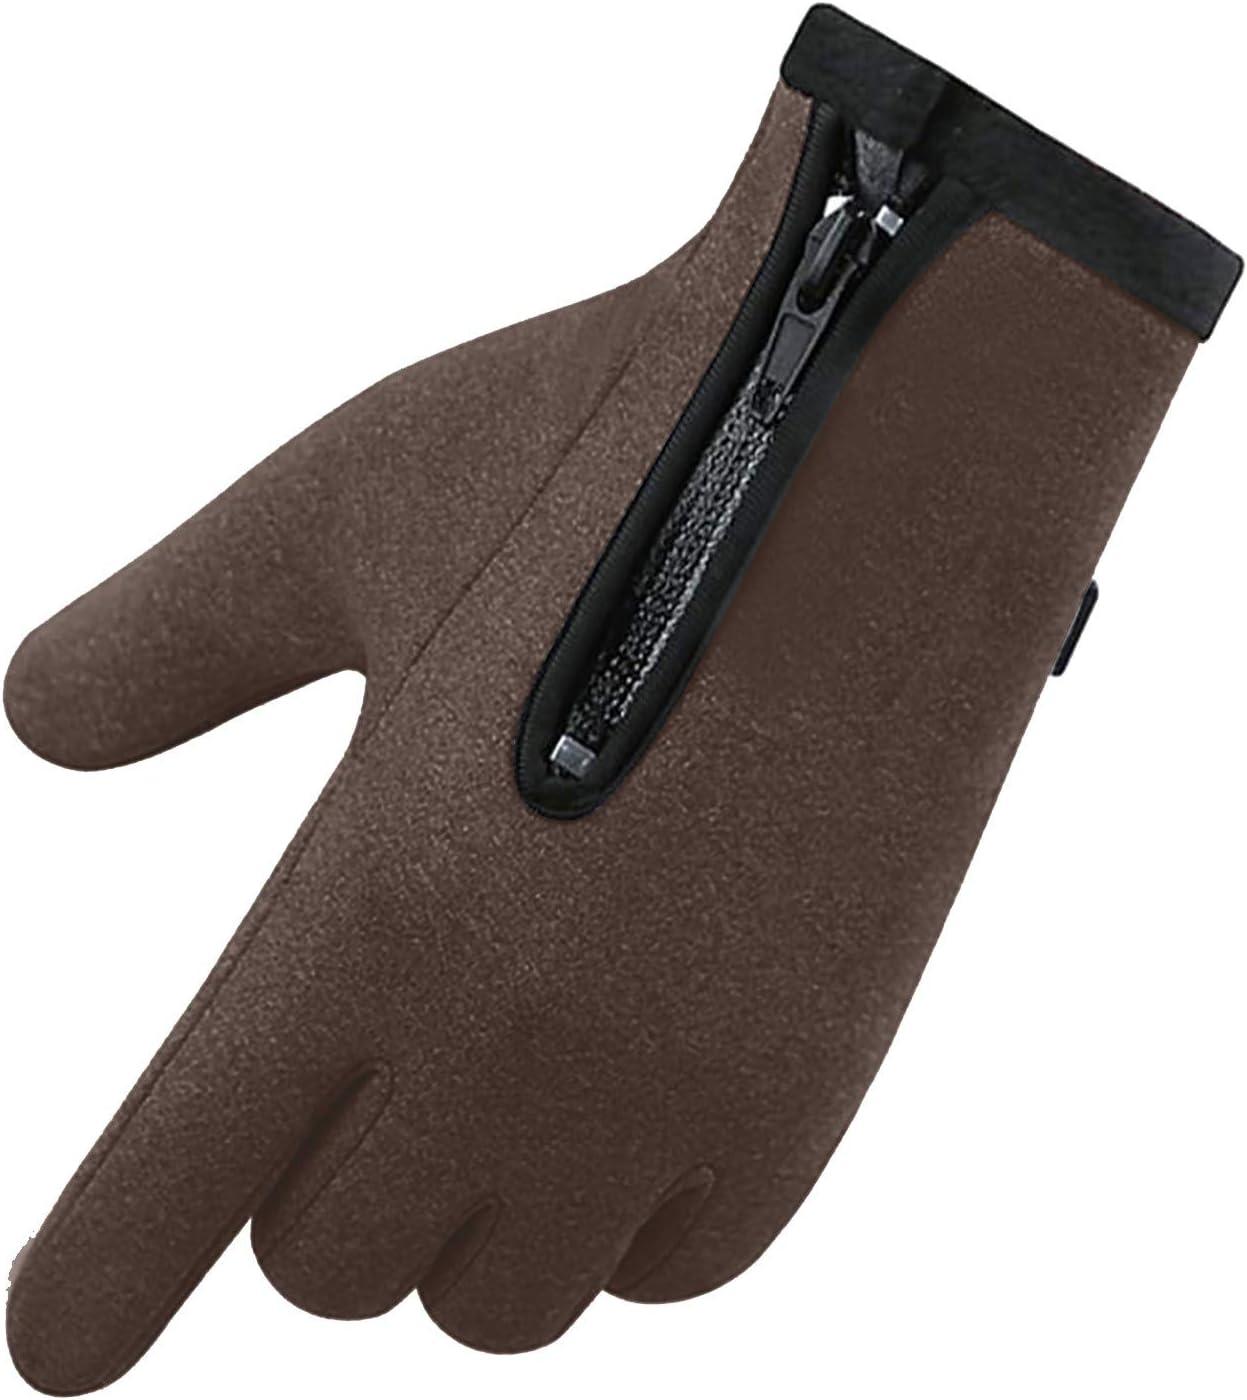 Warm Fleece Mittens Windproof Waterproof Antiskid Gloves Outdoor Sports Zipper Gloves Snow Gloves Ski Gloves